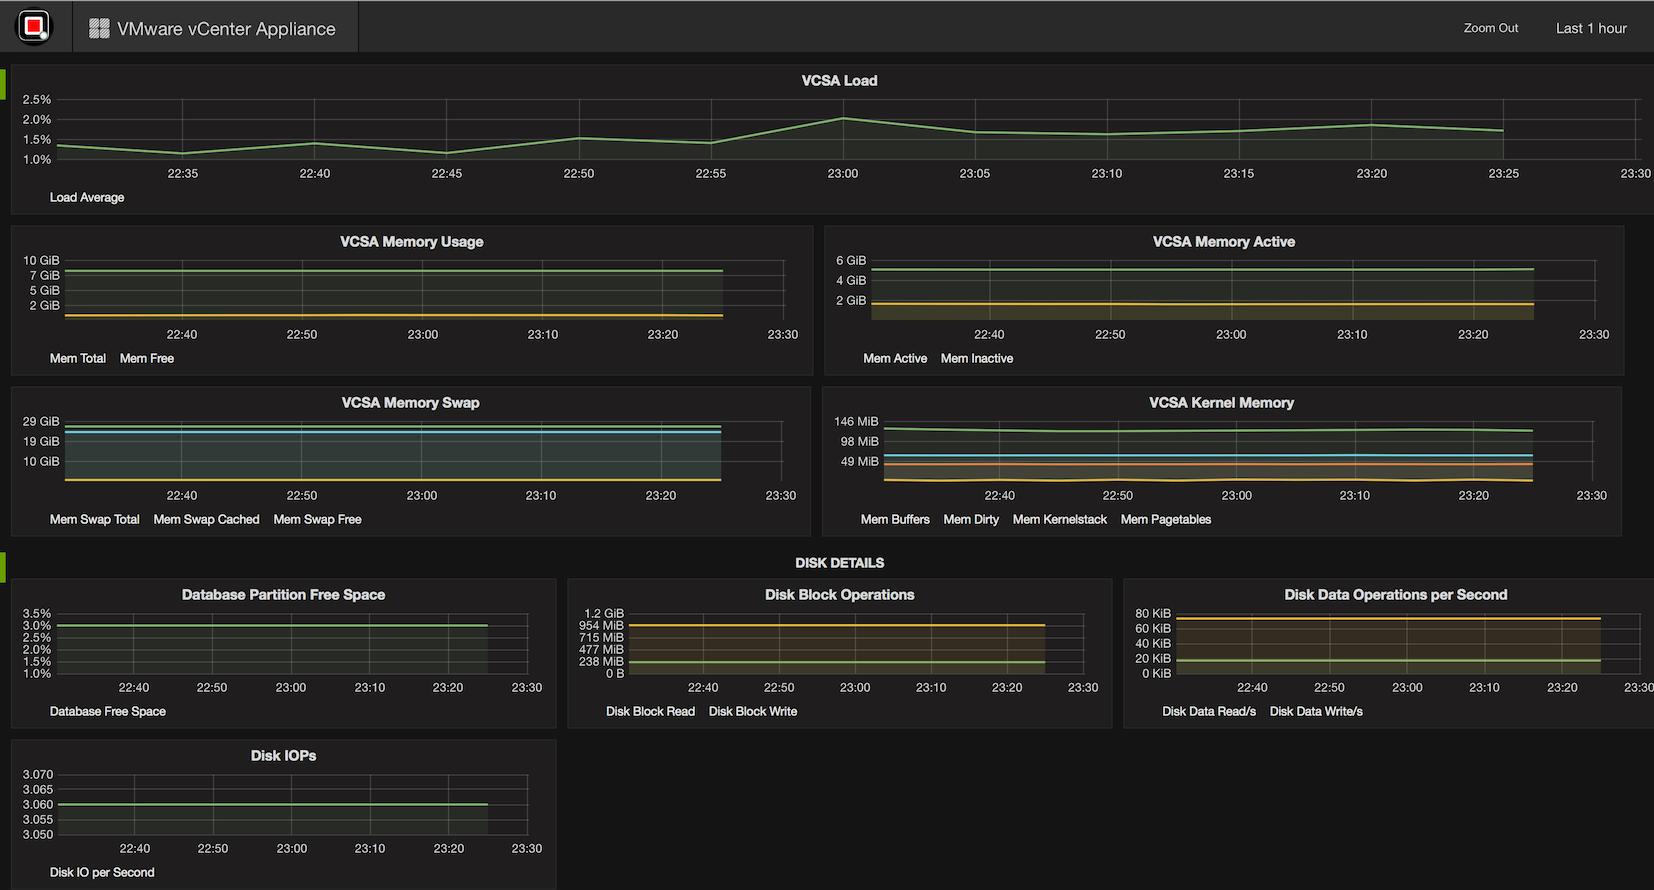 Performance Analyzer - VMware vCenter Appliance (VCSA)